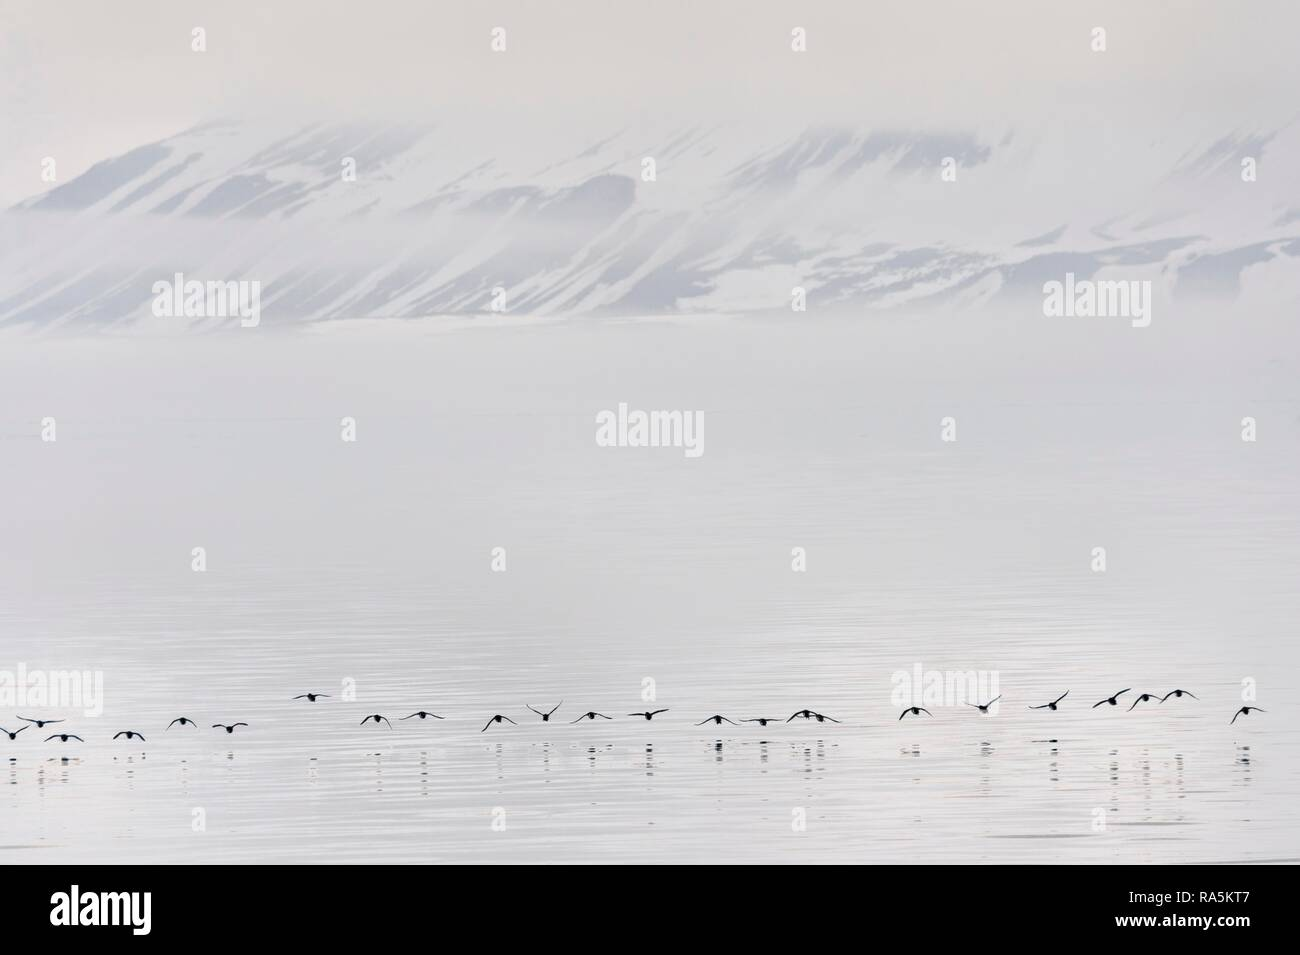 Flock of Thick-billed Murres (Uria lomvia) or Brunnich's guillemots Lying over Hinlopen Strait, Spitsbergen Island Stock Photo